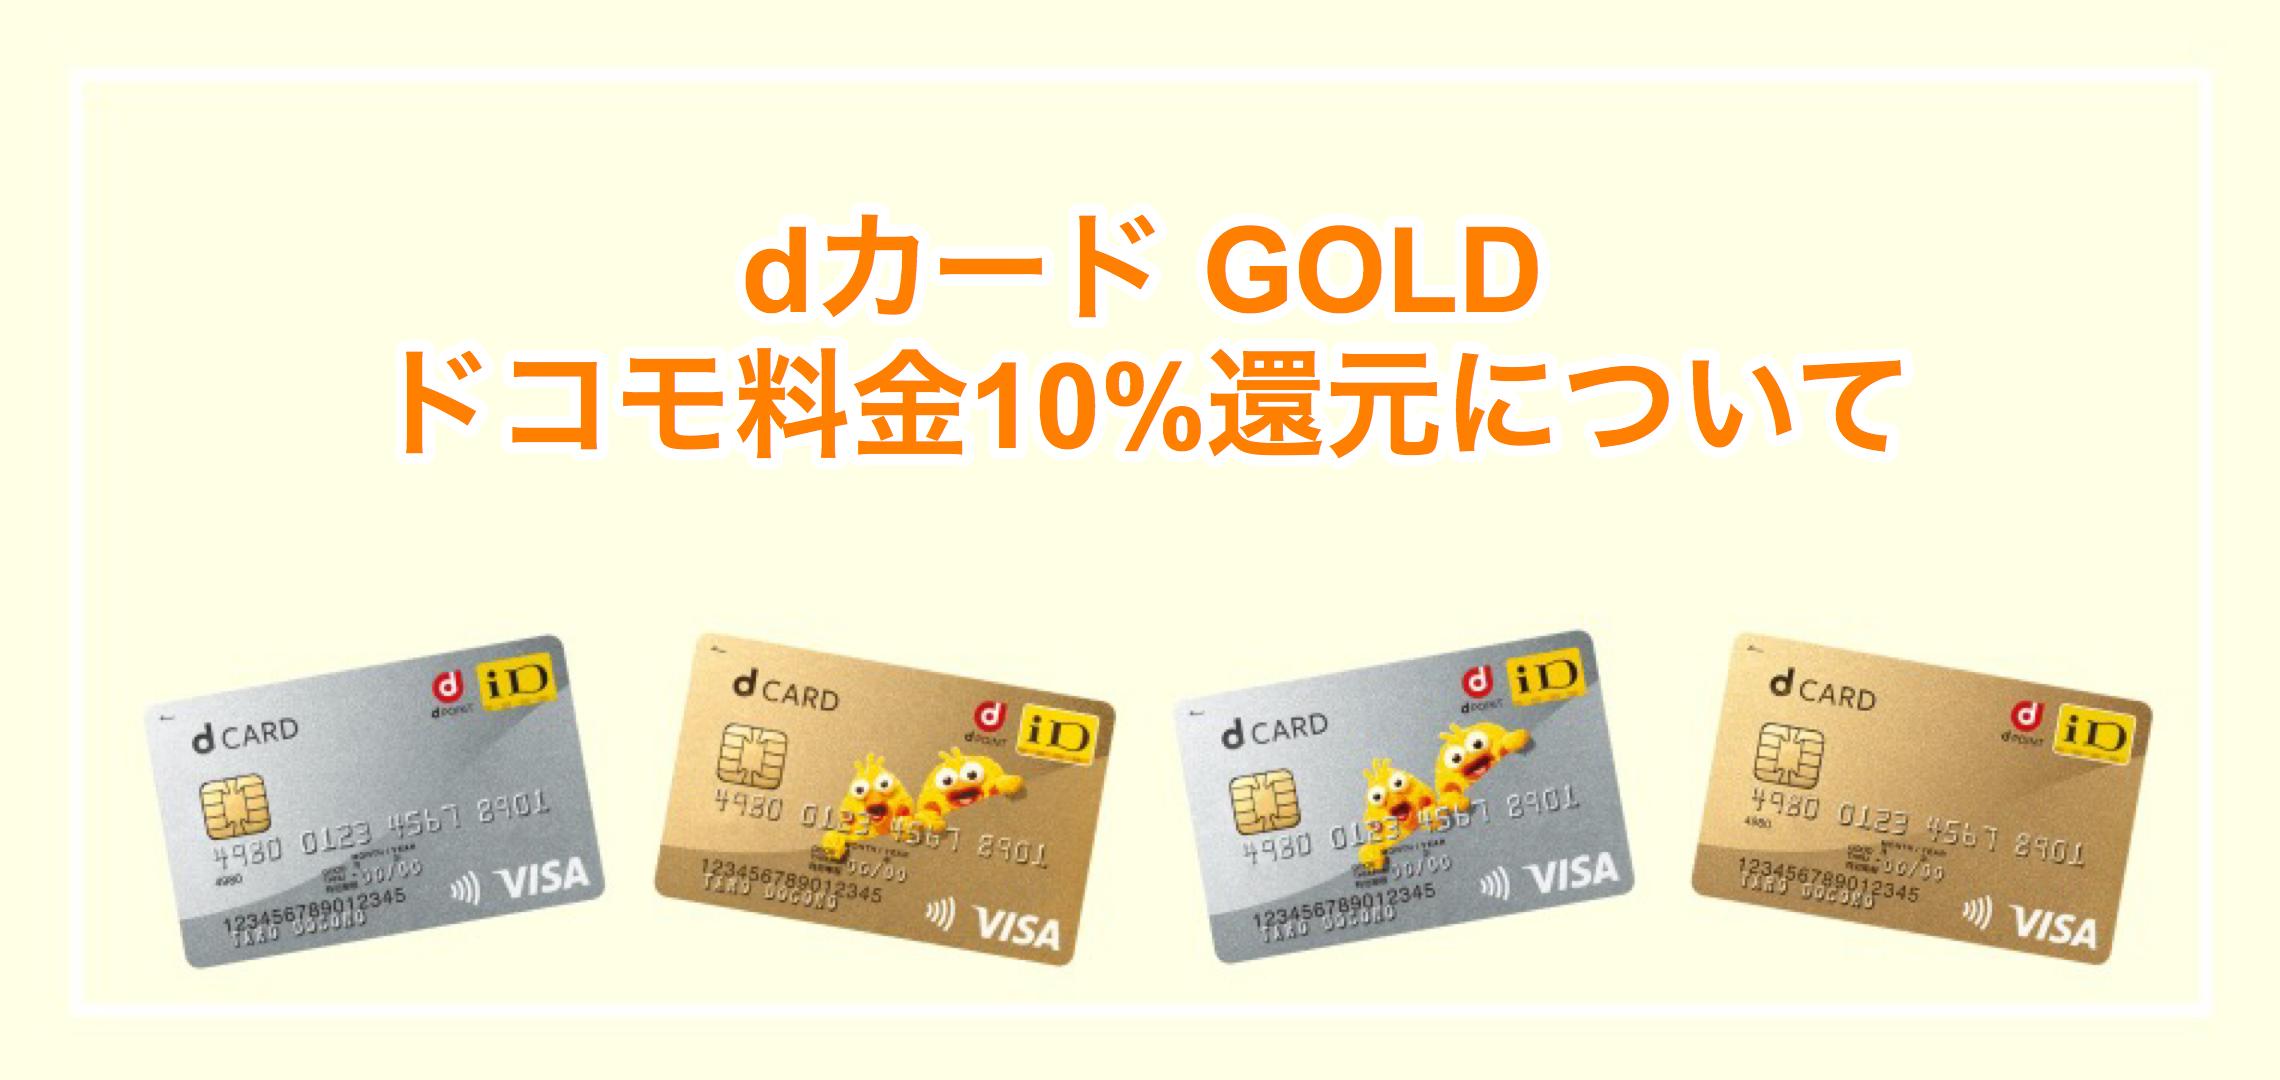 dカード GOLD ドコモ料金10%還元について